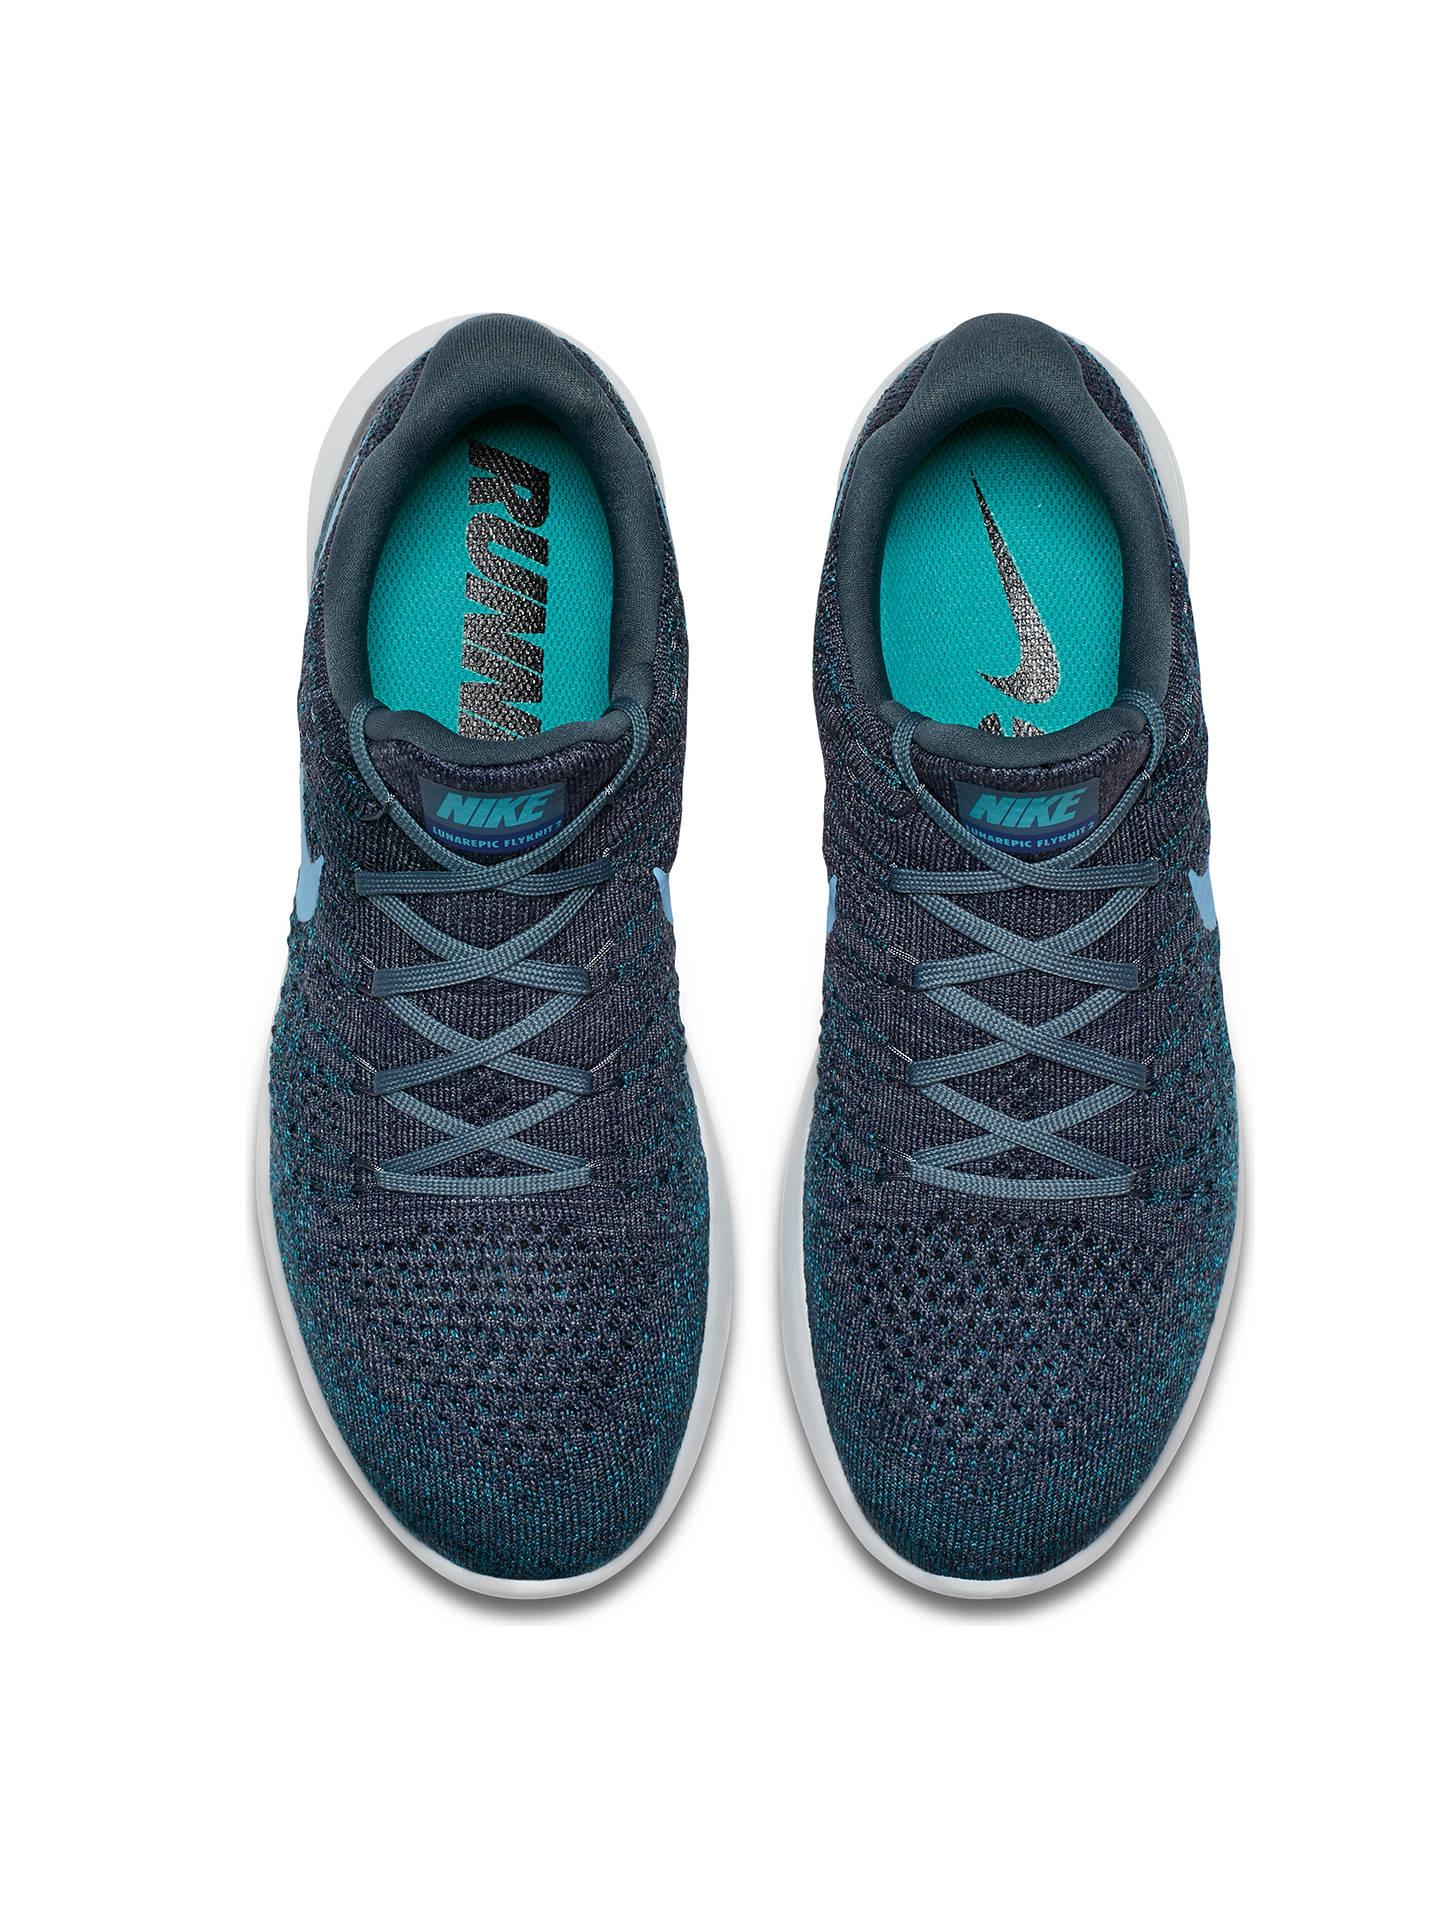 san francisco d7ecd da478 Nike LunarEpic Low Flyknit 2 Men's Running Shoes, Blue at ...